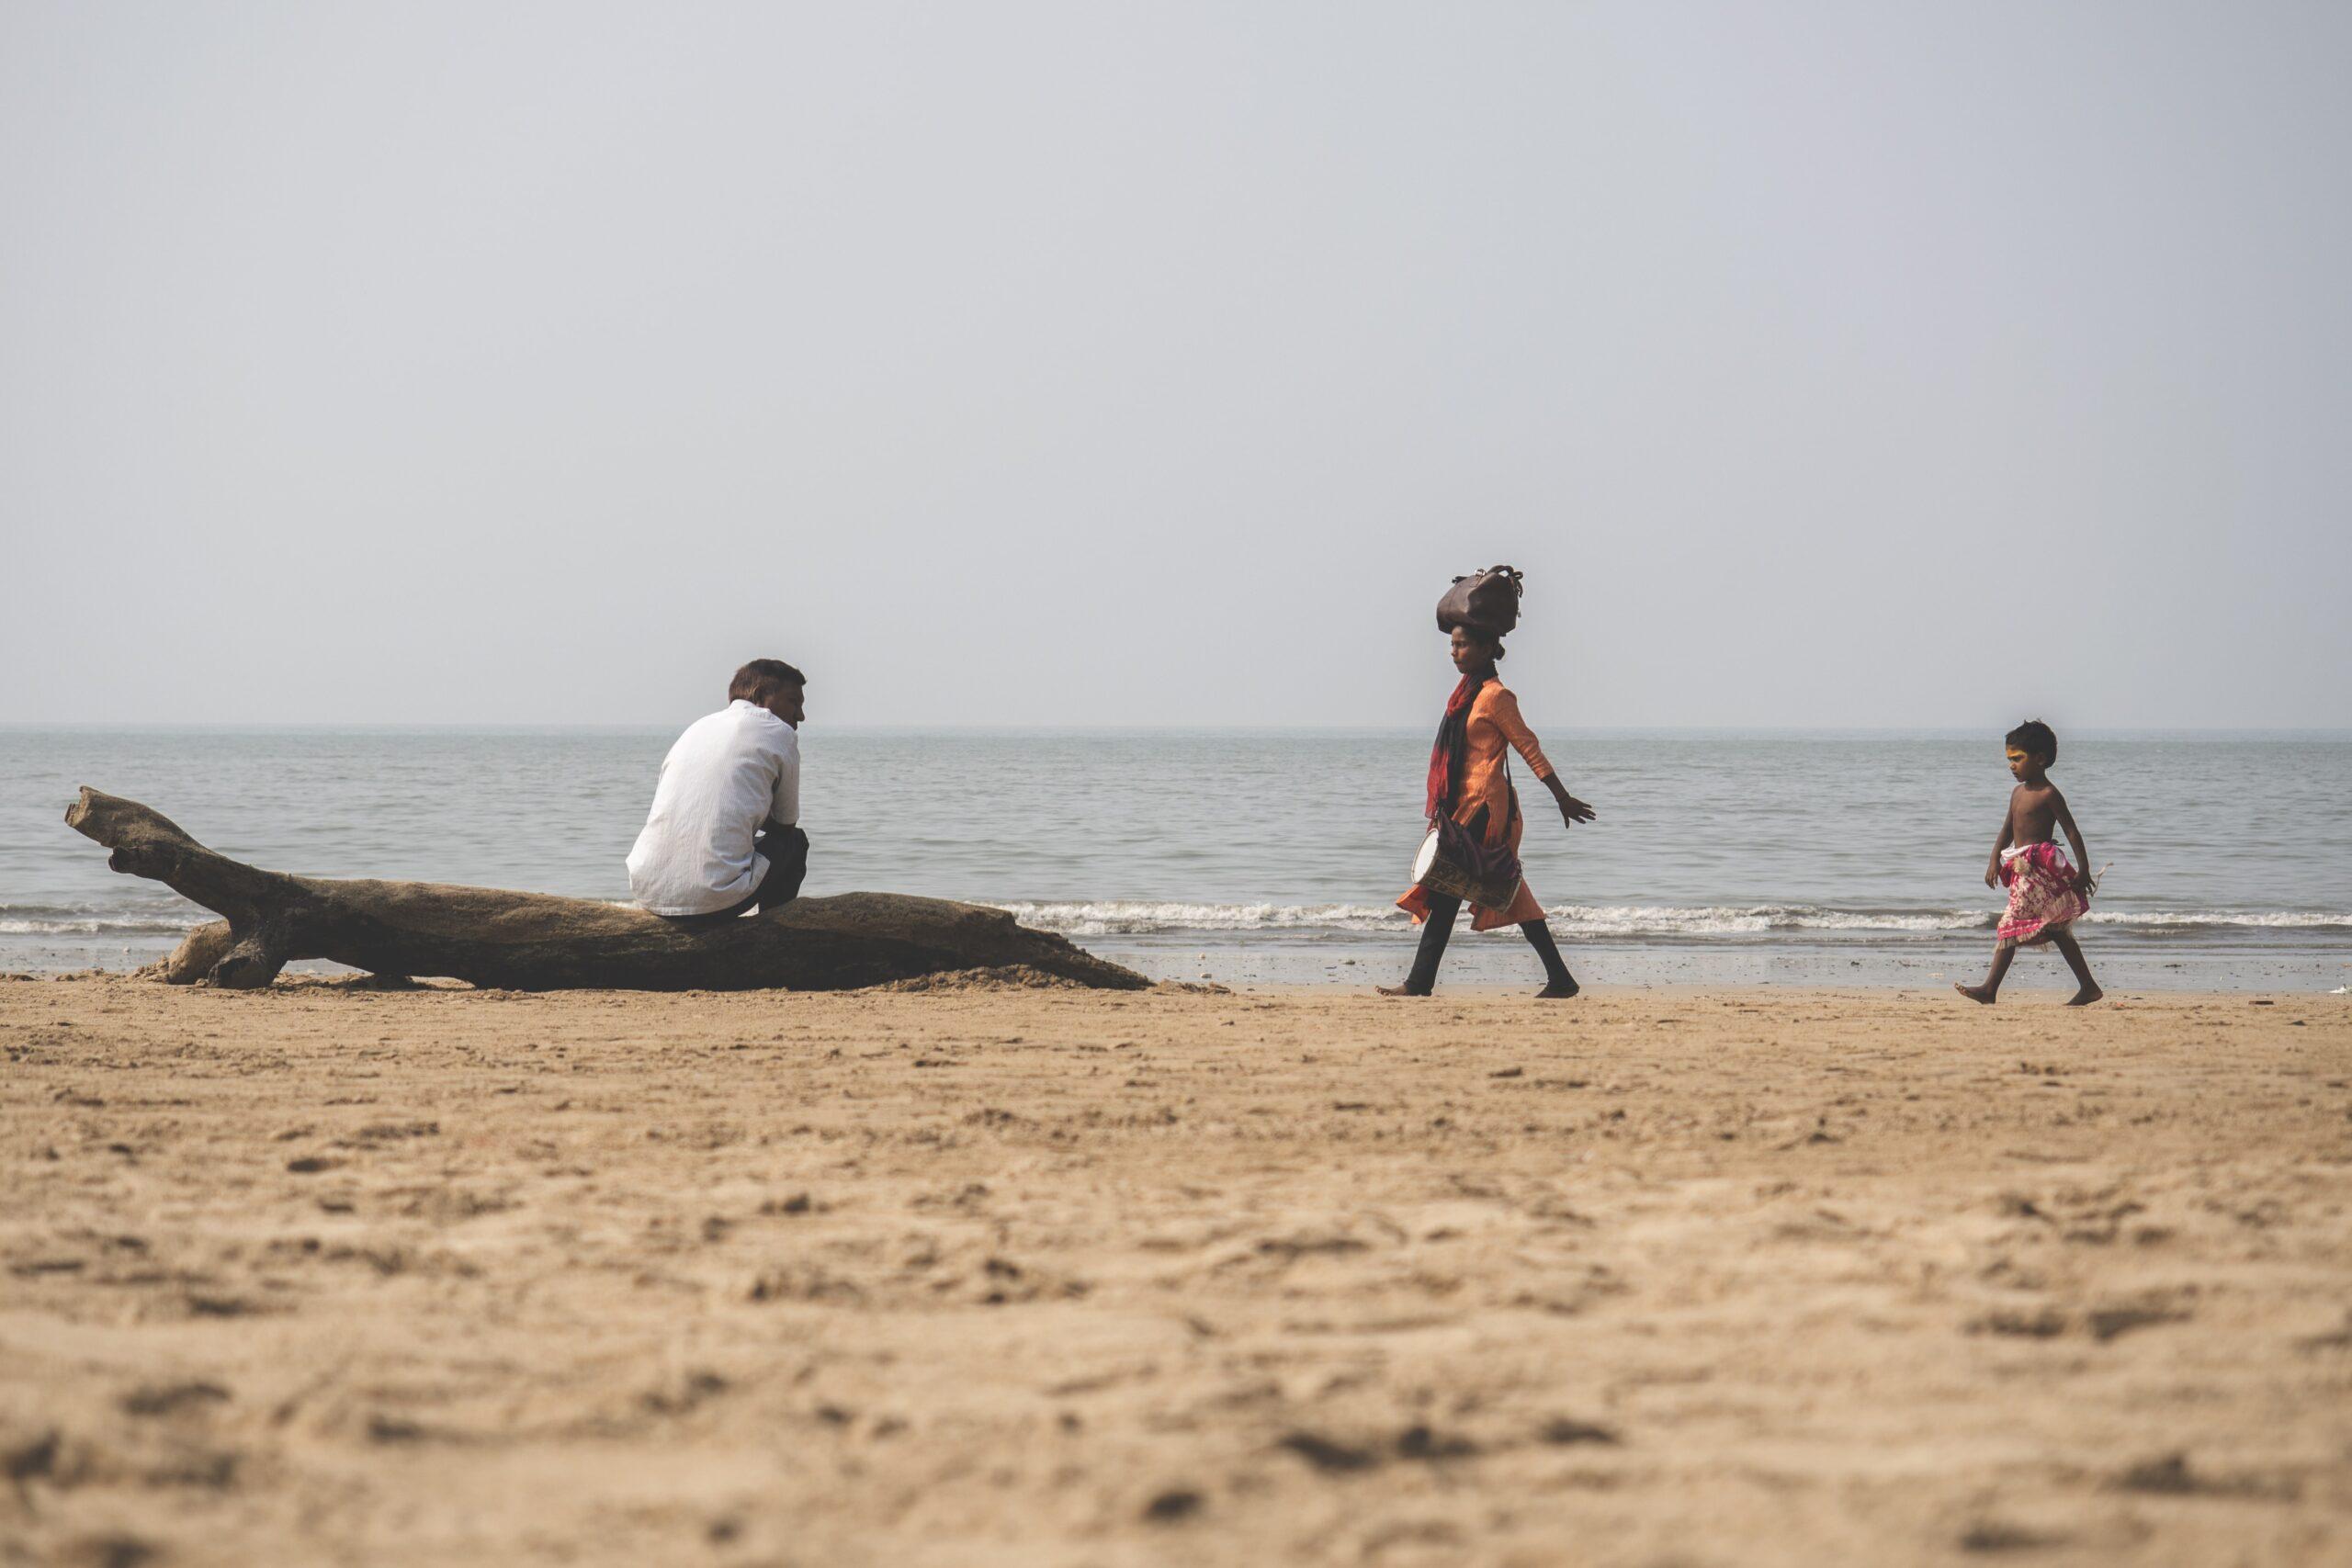 People walking along beach in India